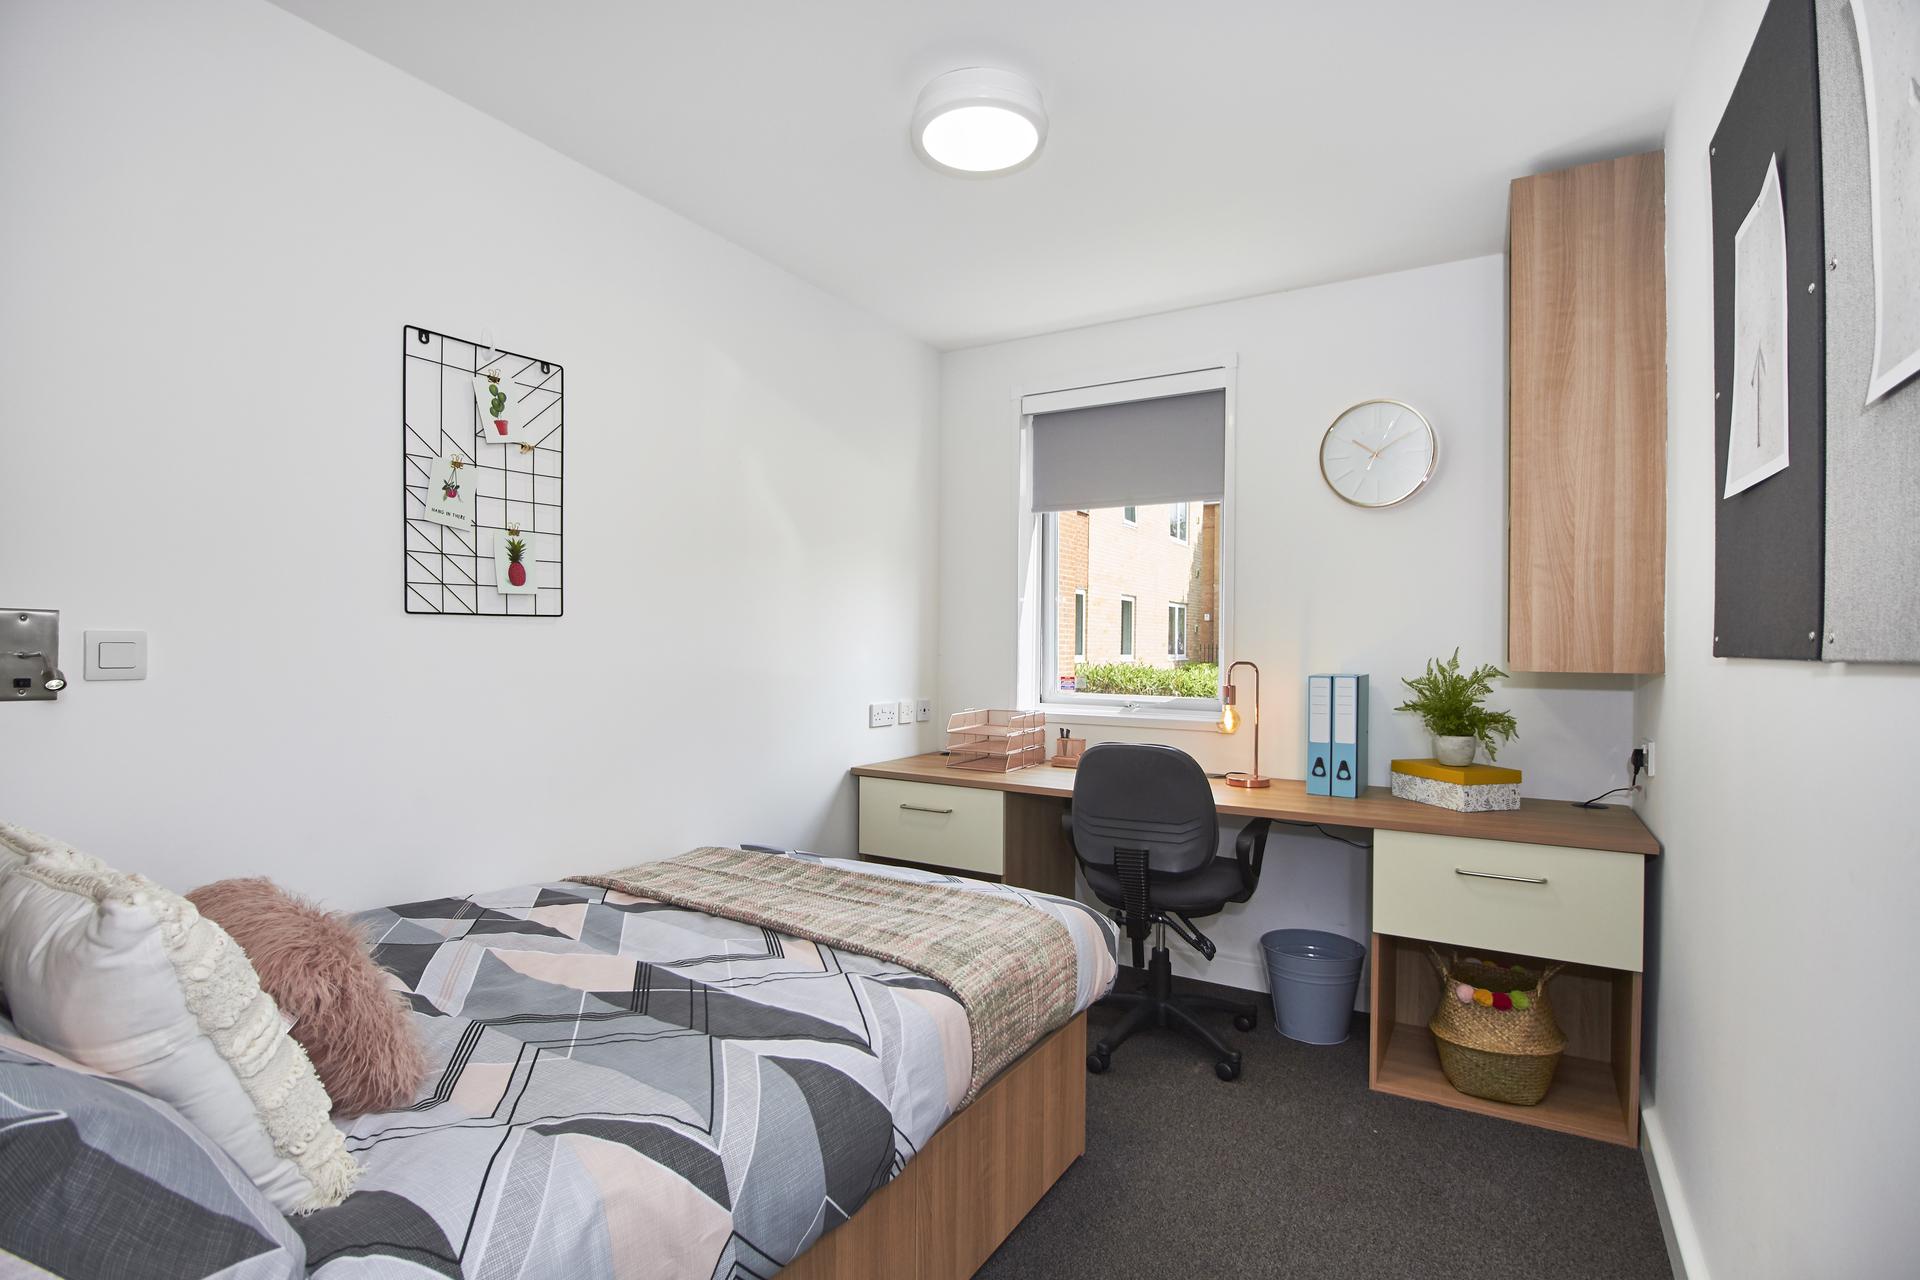 slade park oxford student accommodation